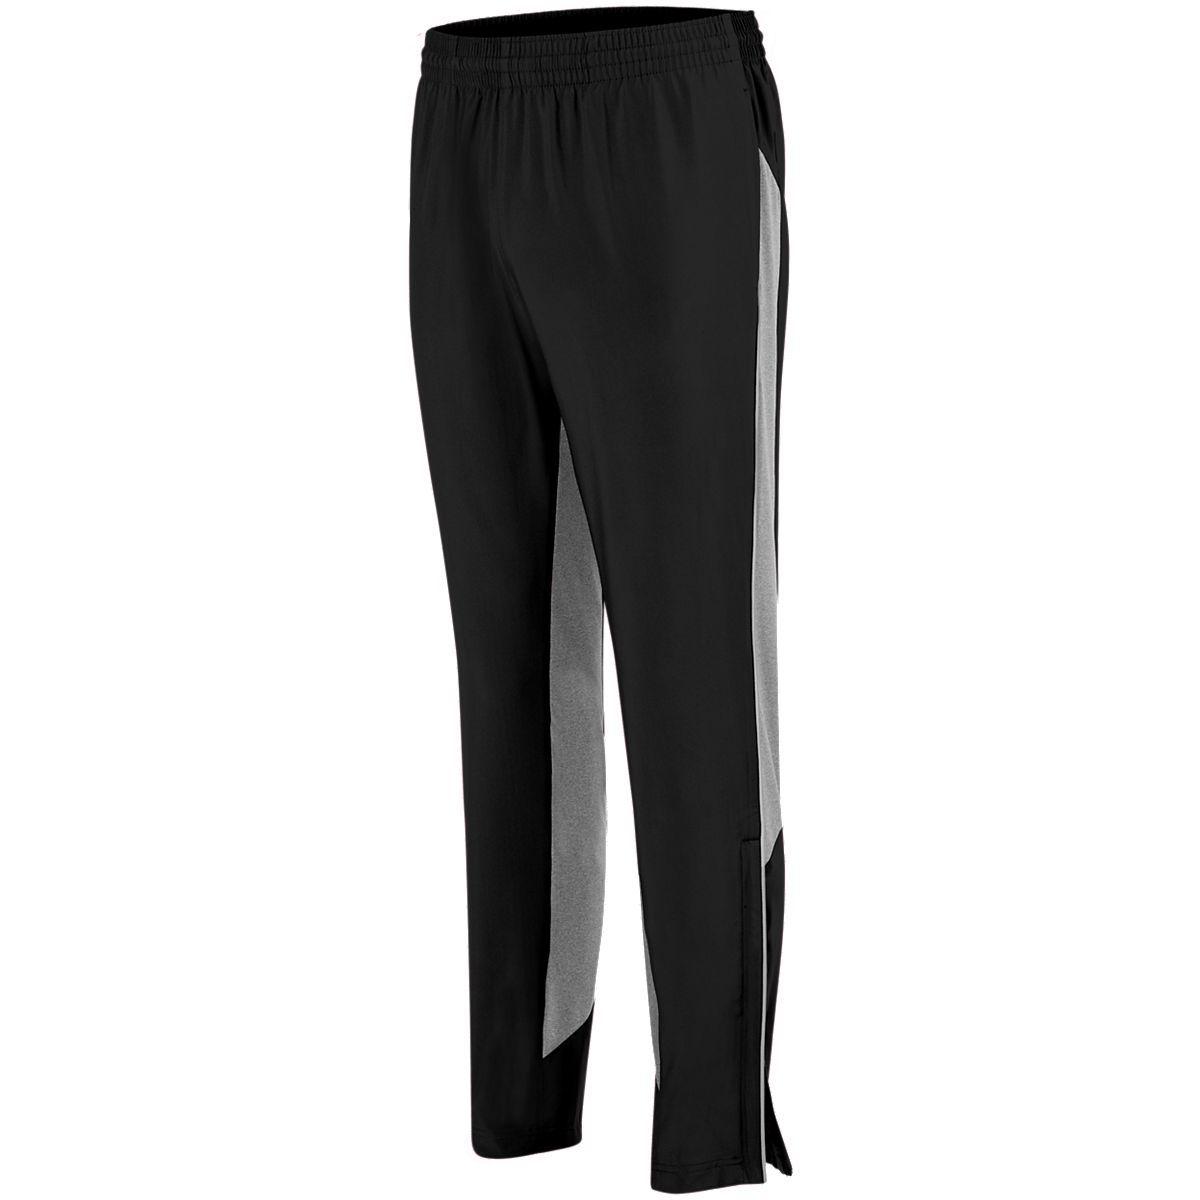 Preeminent Tapered Pant - BLACK/GRAPHITE HEATHER